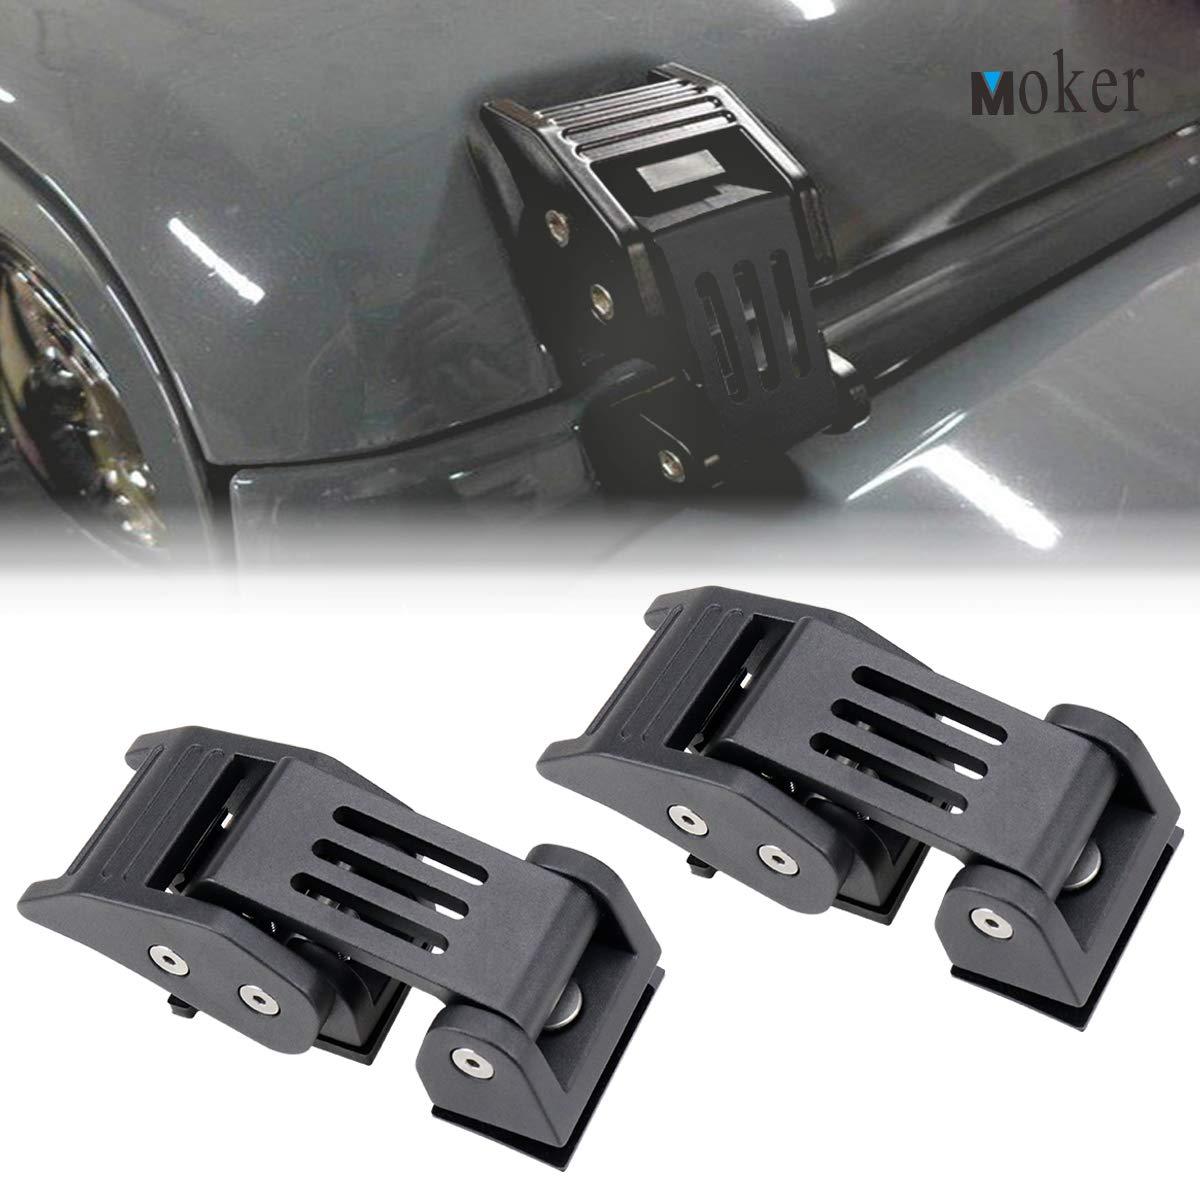 Moker 53221 Heavy Duty Hood Latches Catch Set for 2007-2018 Jeep Wrangler JK & Unlimited - Pair